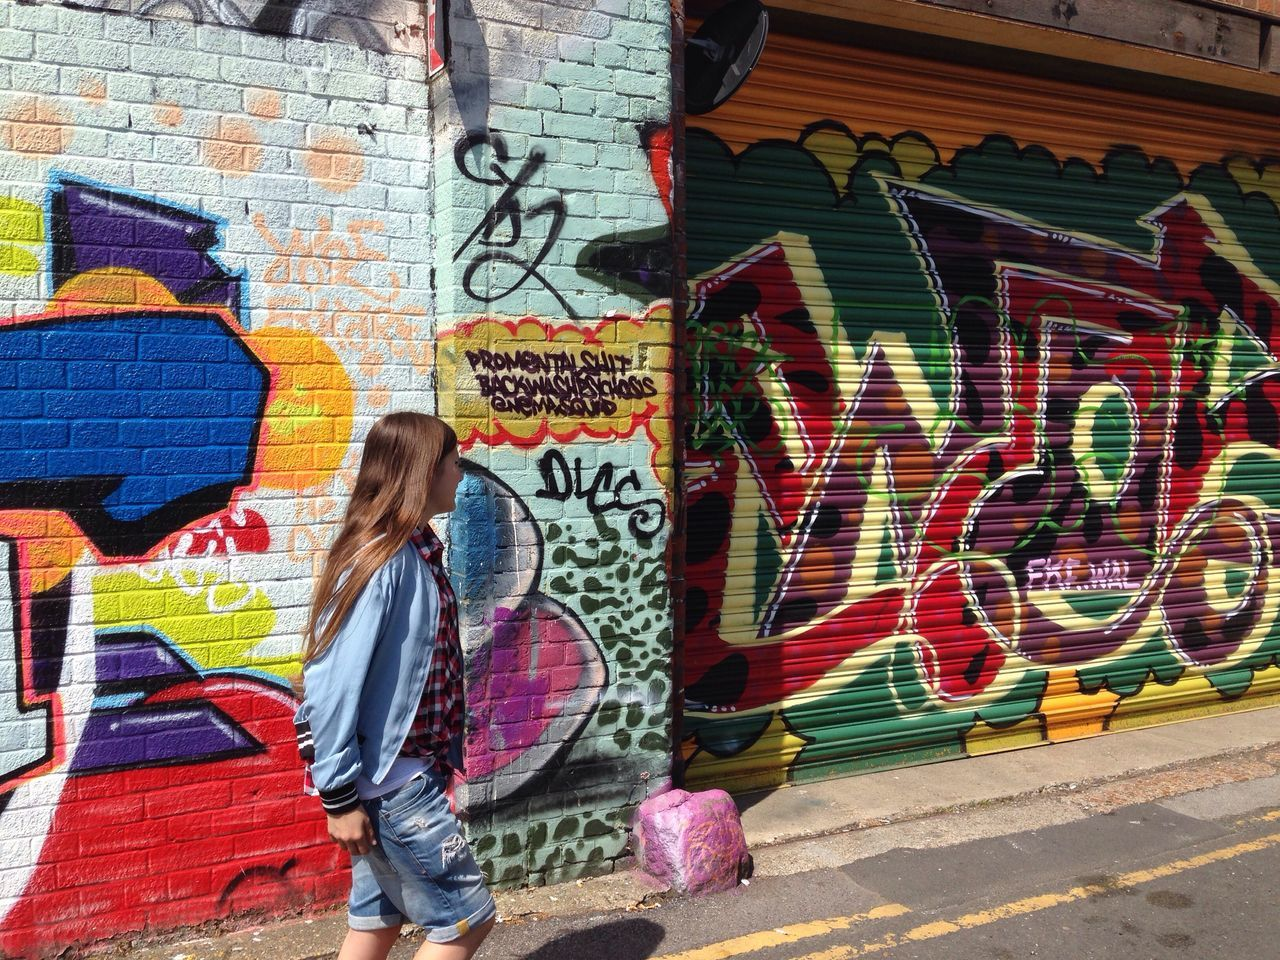 Brighton Graff Shootermag Malephotographerofthemonth Brighton Fuzed_fotos Art Streetart/graffiti Streetart Graffitiporn Graffiti Art Graffiti